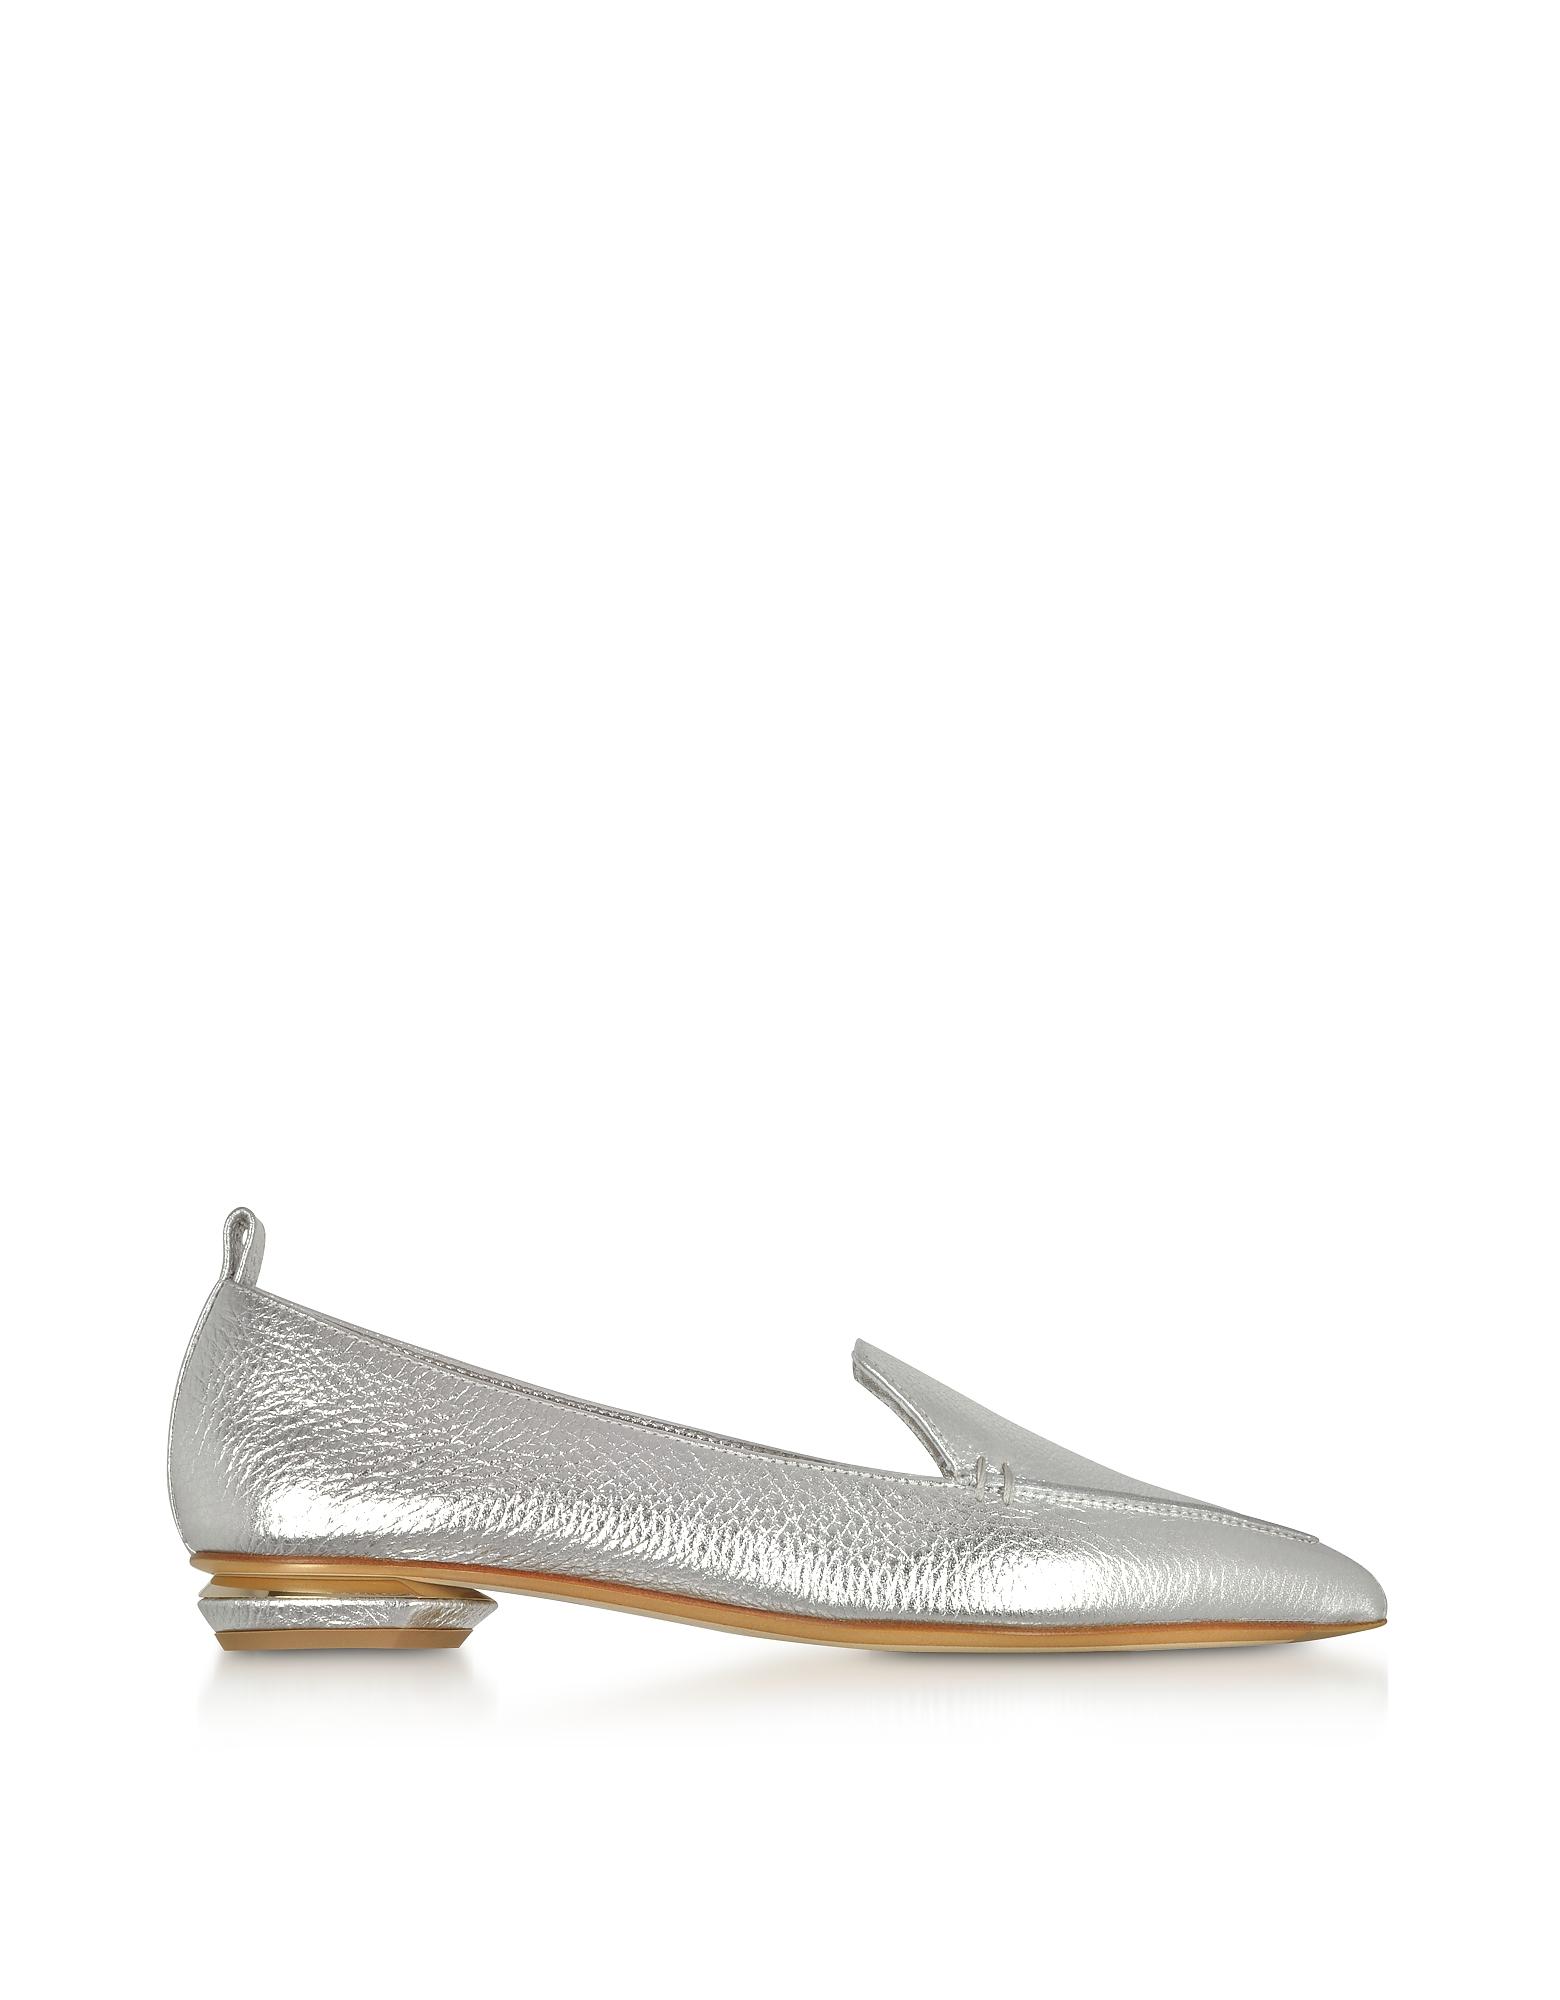 Nicholas Kirkwood Shoes, Beya Metallic Silver Tumbled Leather Loafers